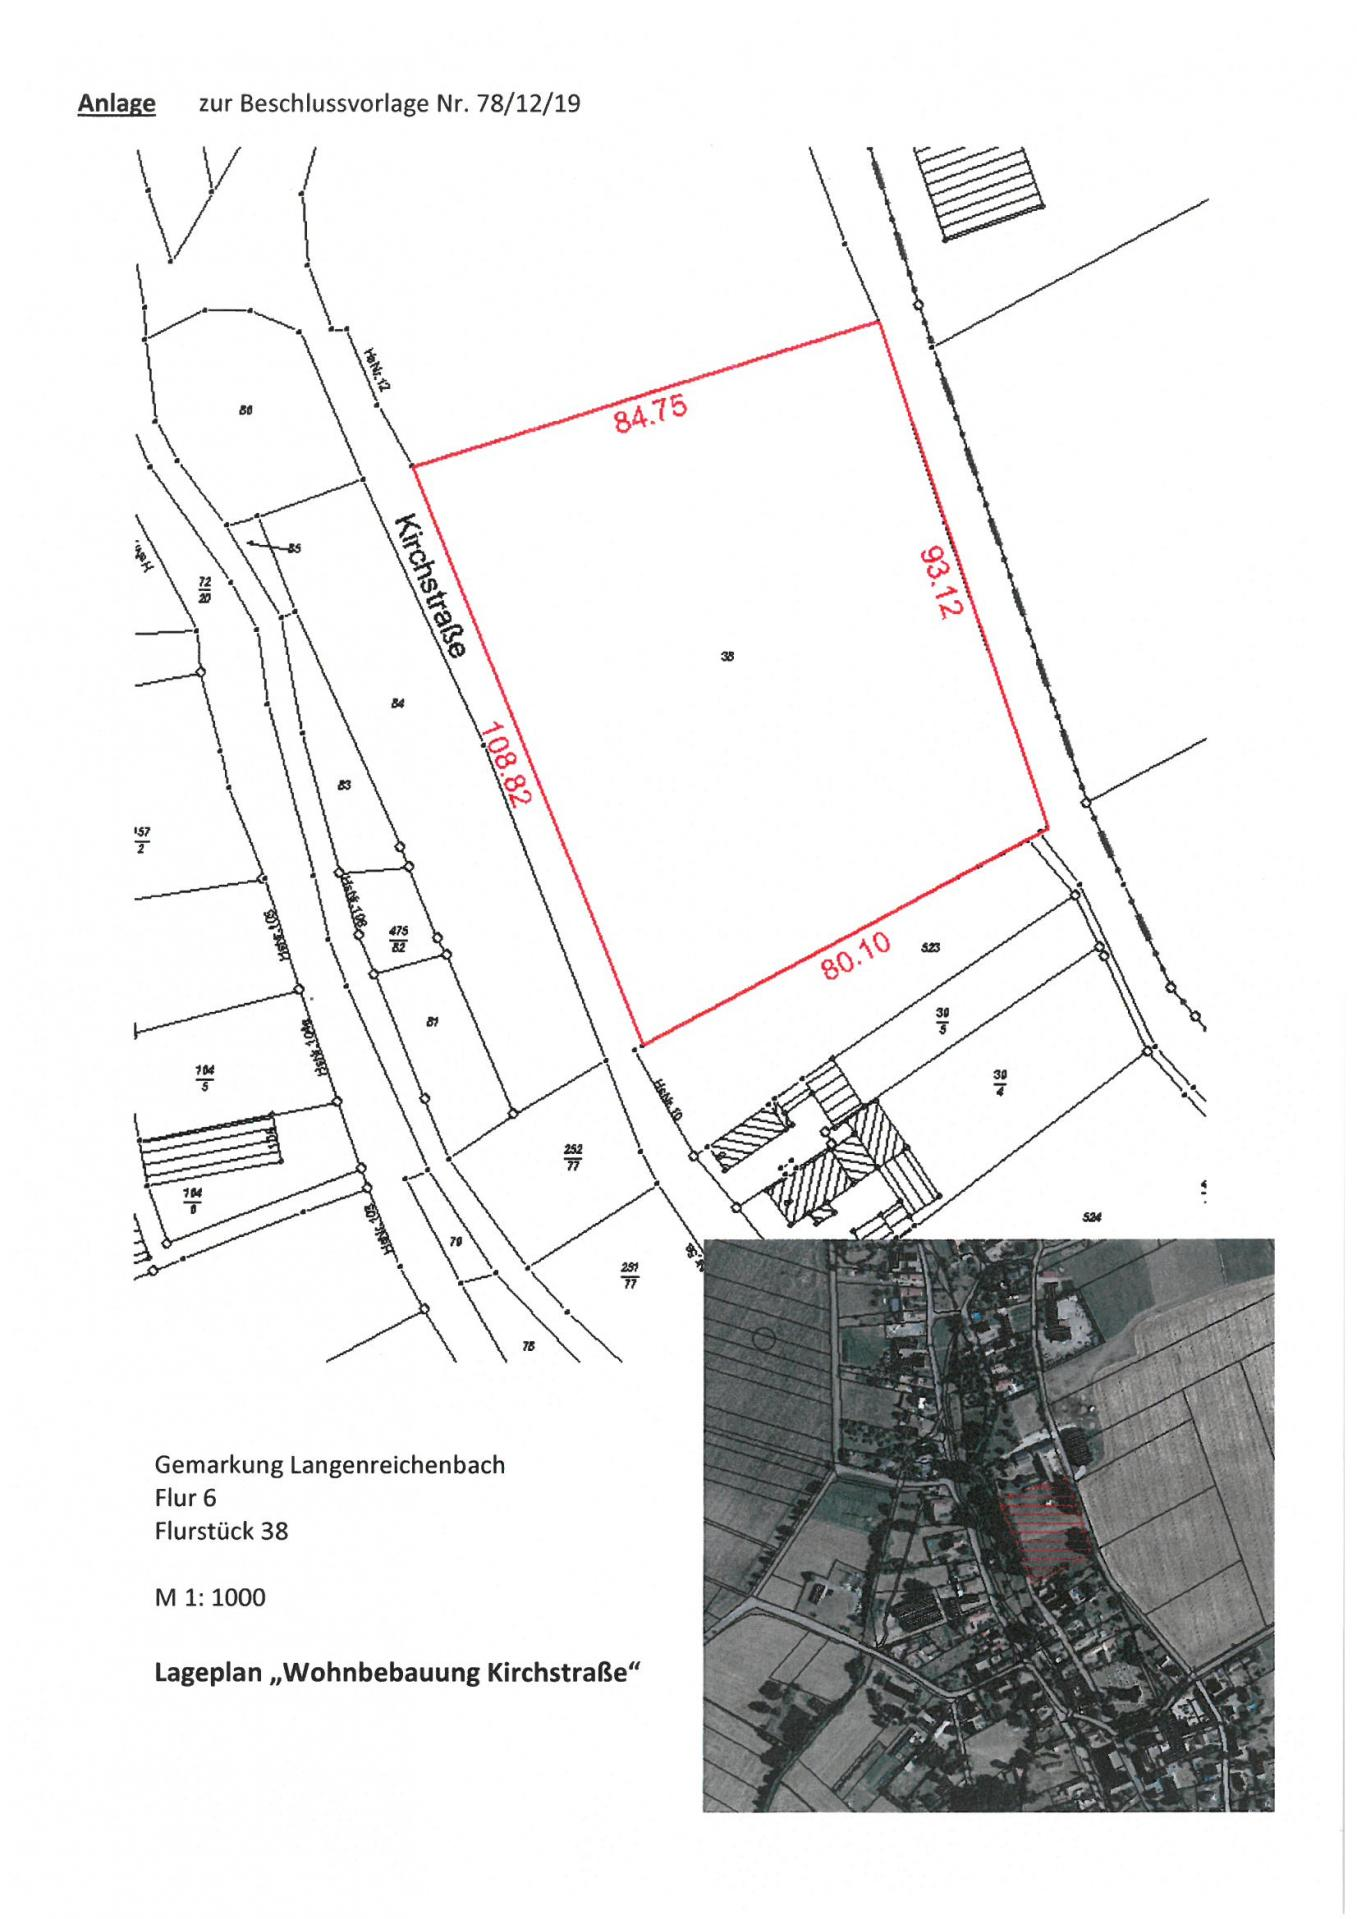 Lageplan Wohnbebauung Kirchstraße